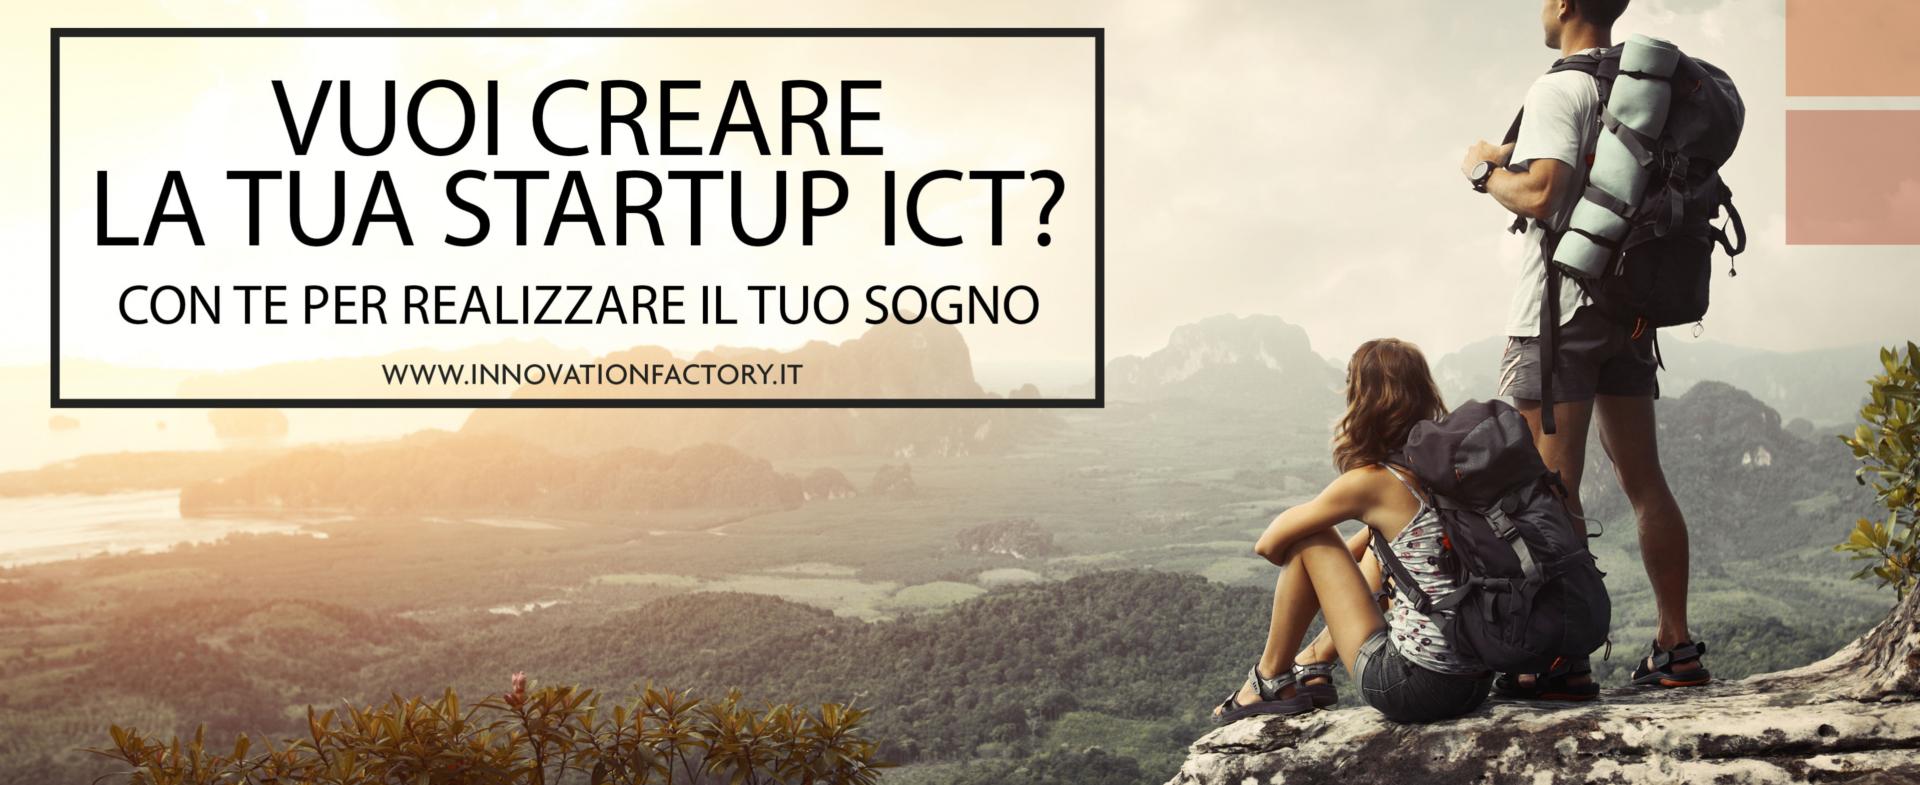 https://www.areasciencepark.it/blog/2016/07/04/tilt-innovation-factory-lancia-un-nuovo-bando-ifchallenge-in-ambito-ict/